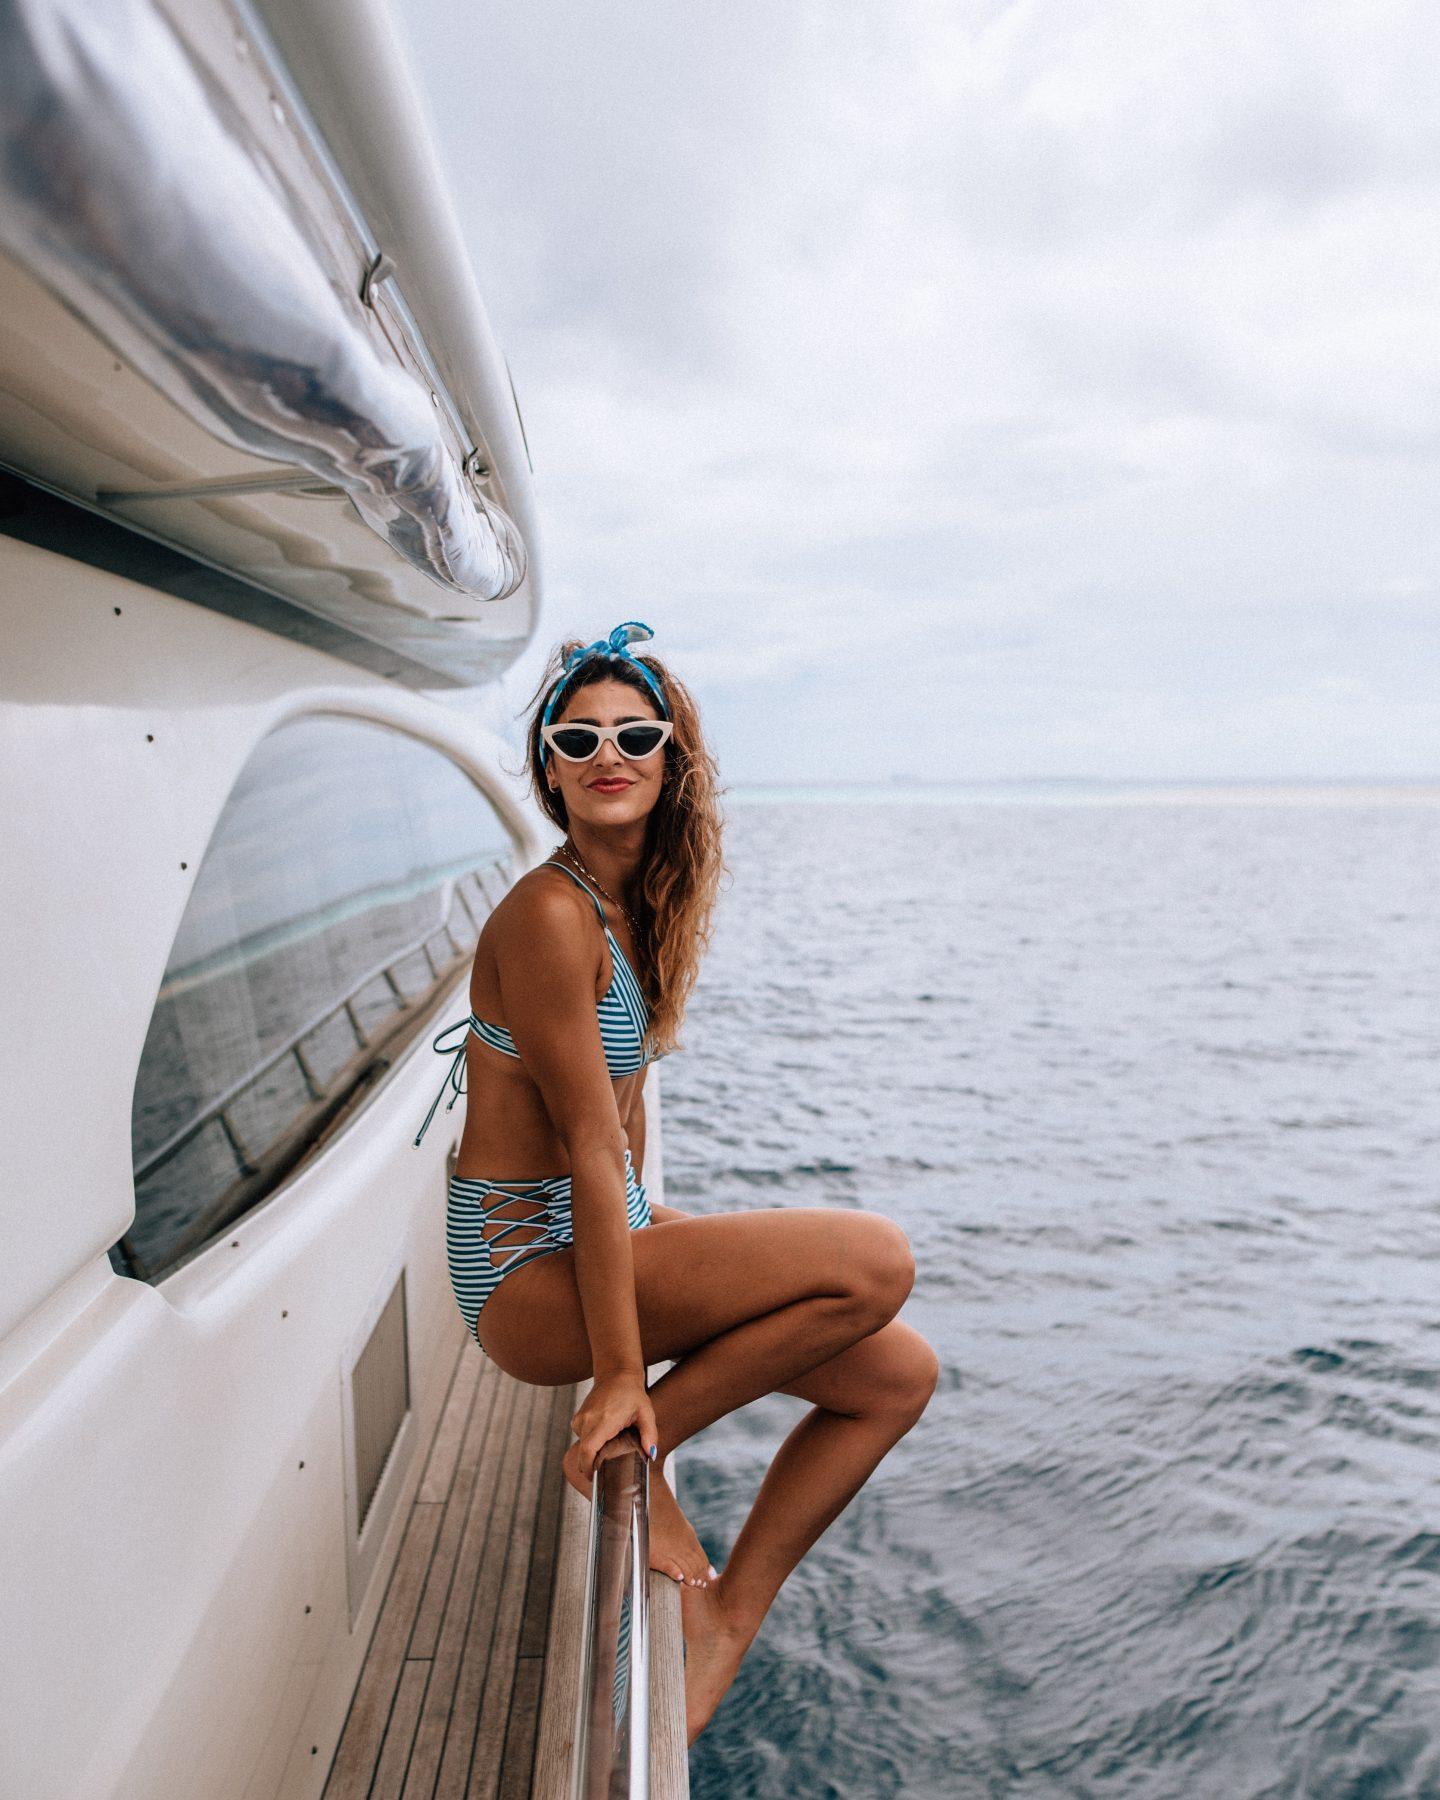 Nawaimaa luxury yacht in the Maldives